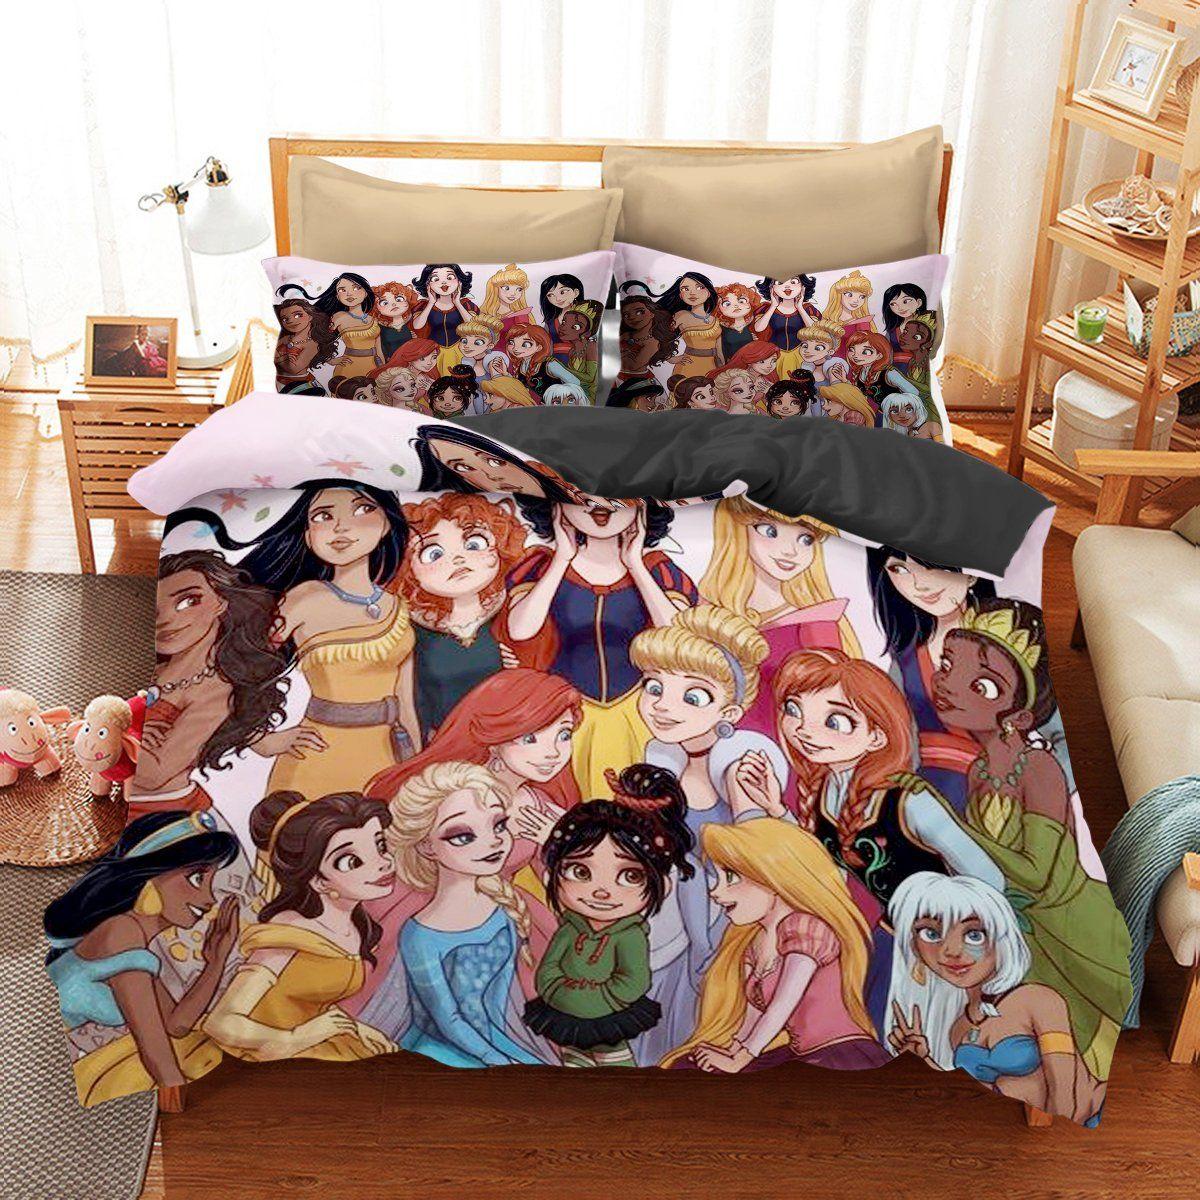 Bedding set princess of disney cartoon funny gift idea